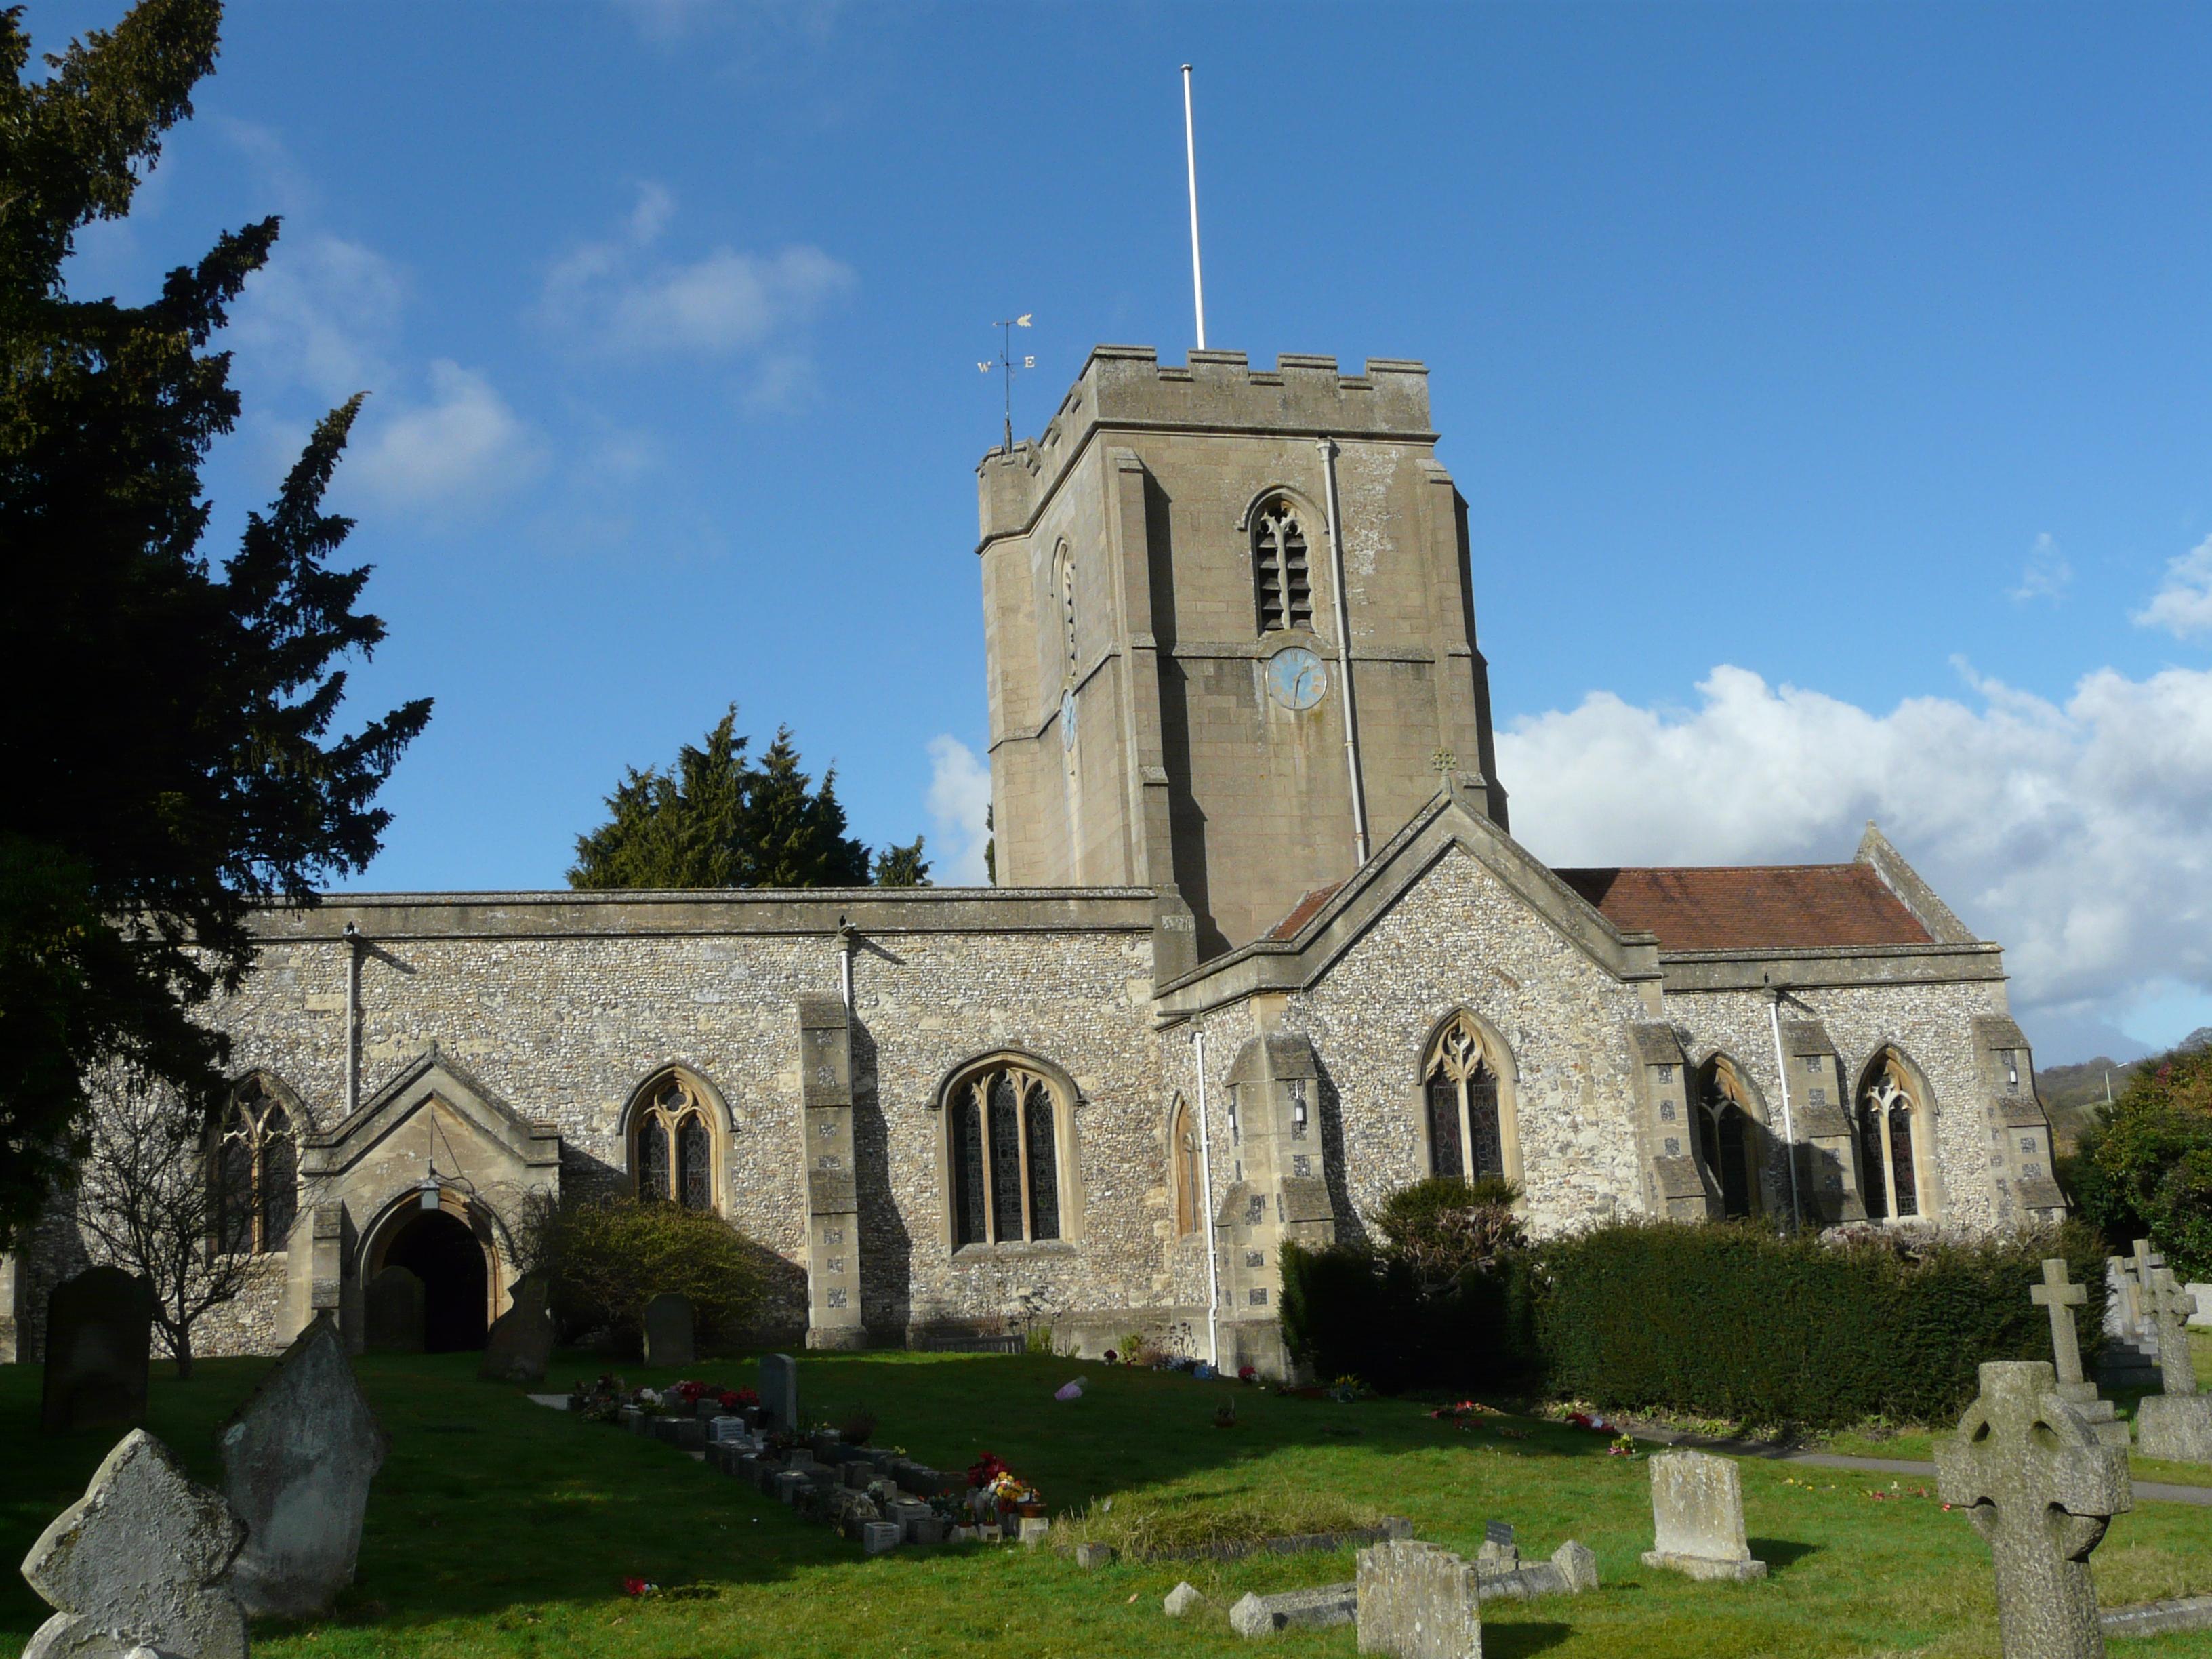 St Mary, Northchurch | Hertfordshire Churches in photographs